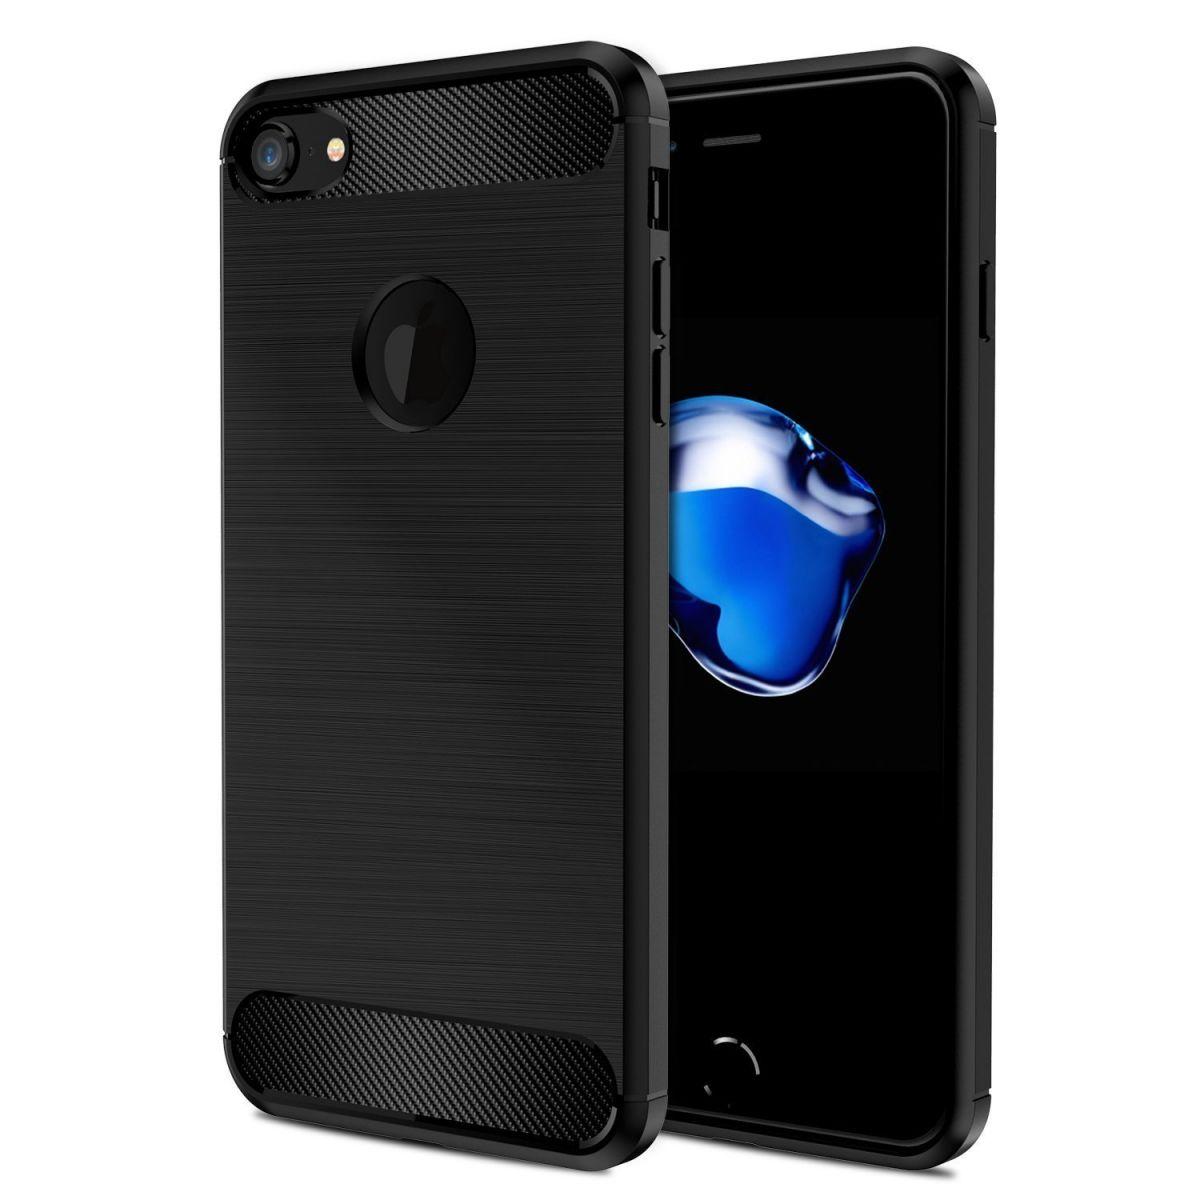 Pouzdro Beweare Ohebné carbon iPhone 7 / iPhone 8 - černé